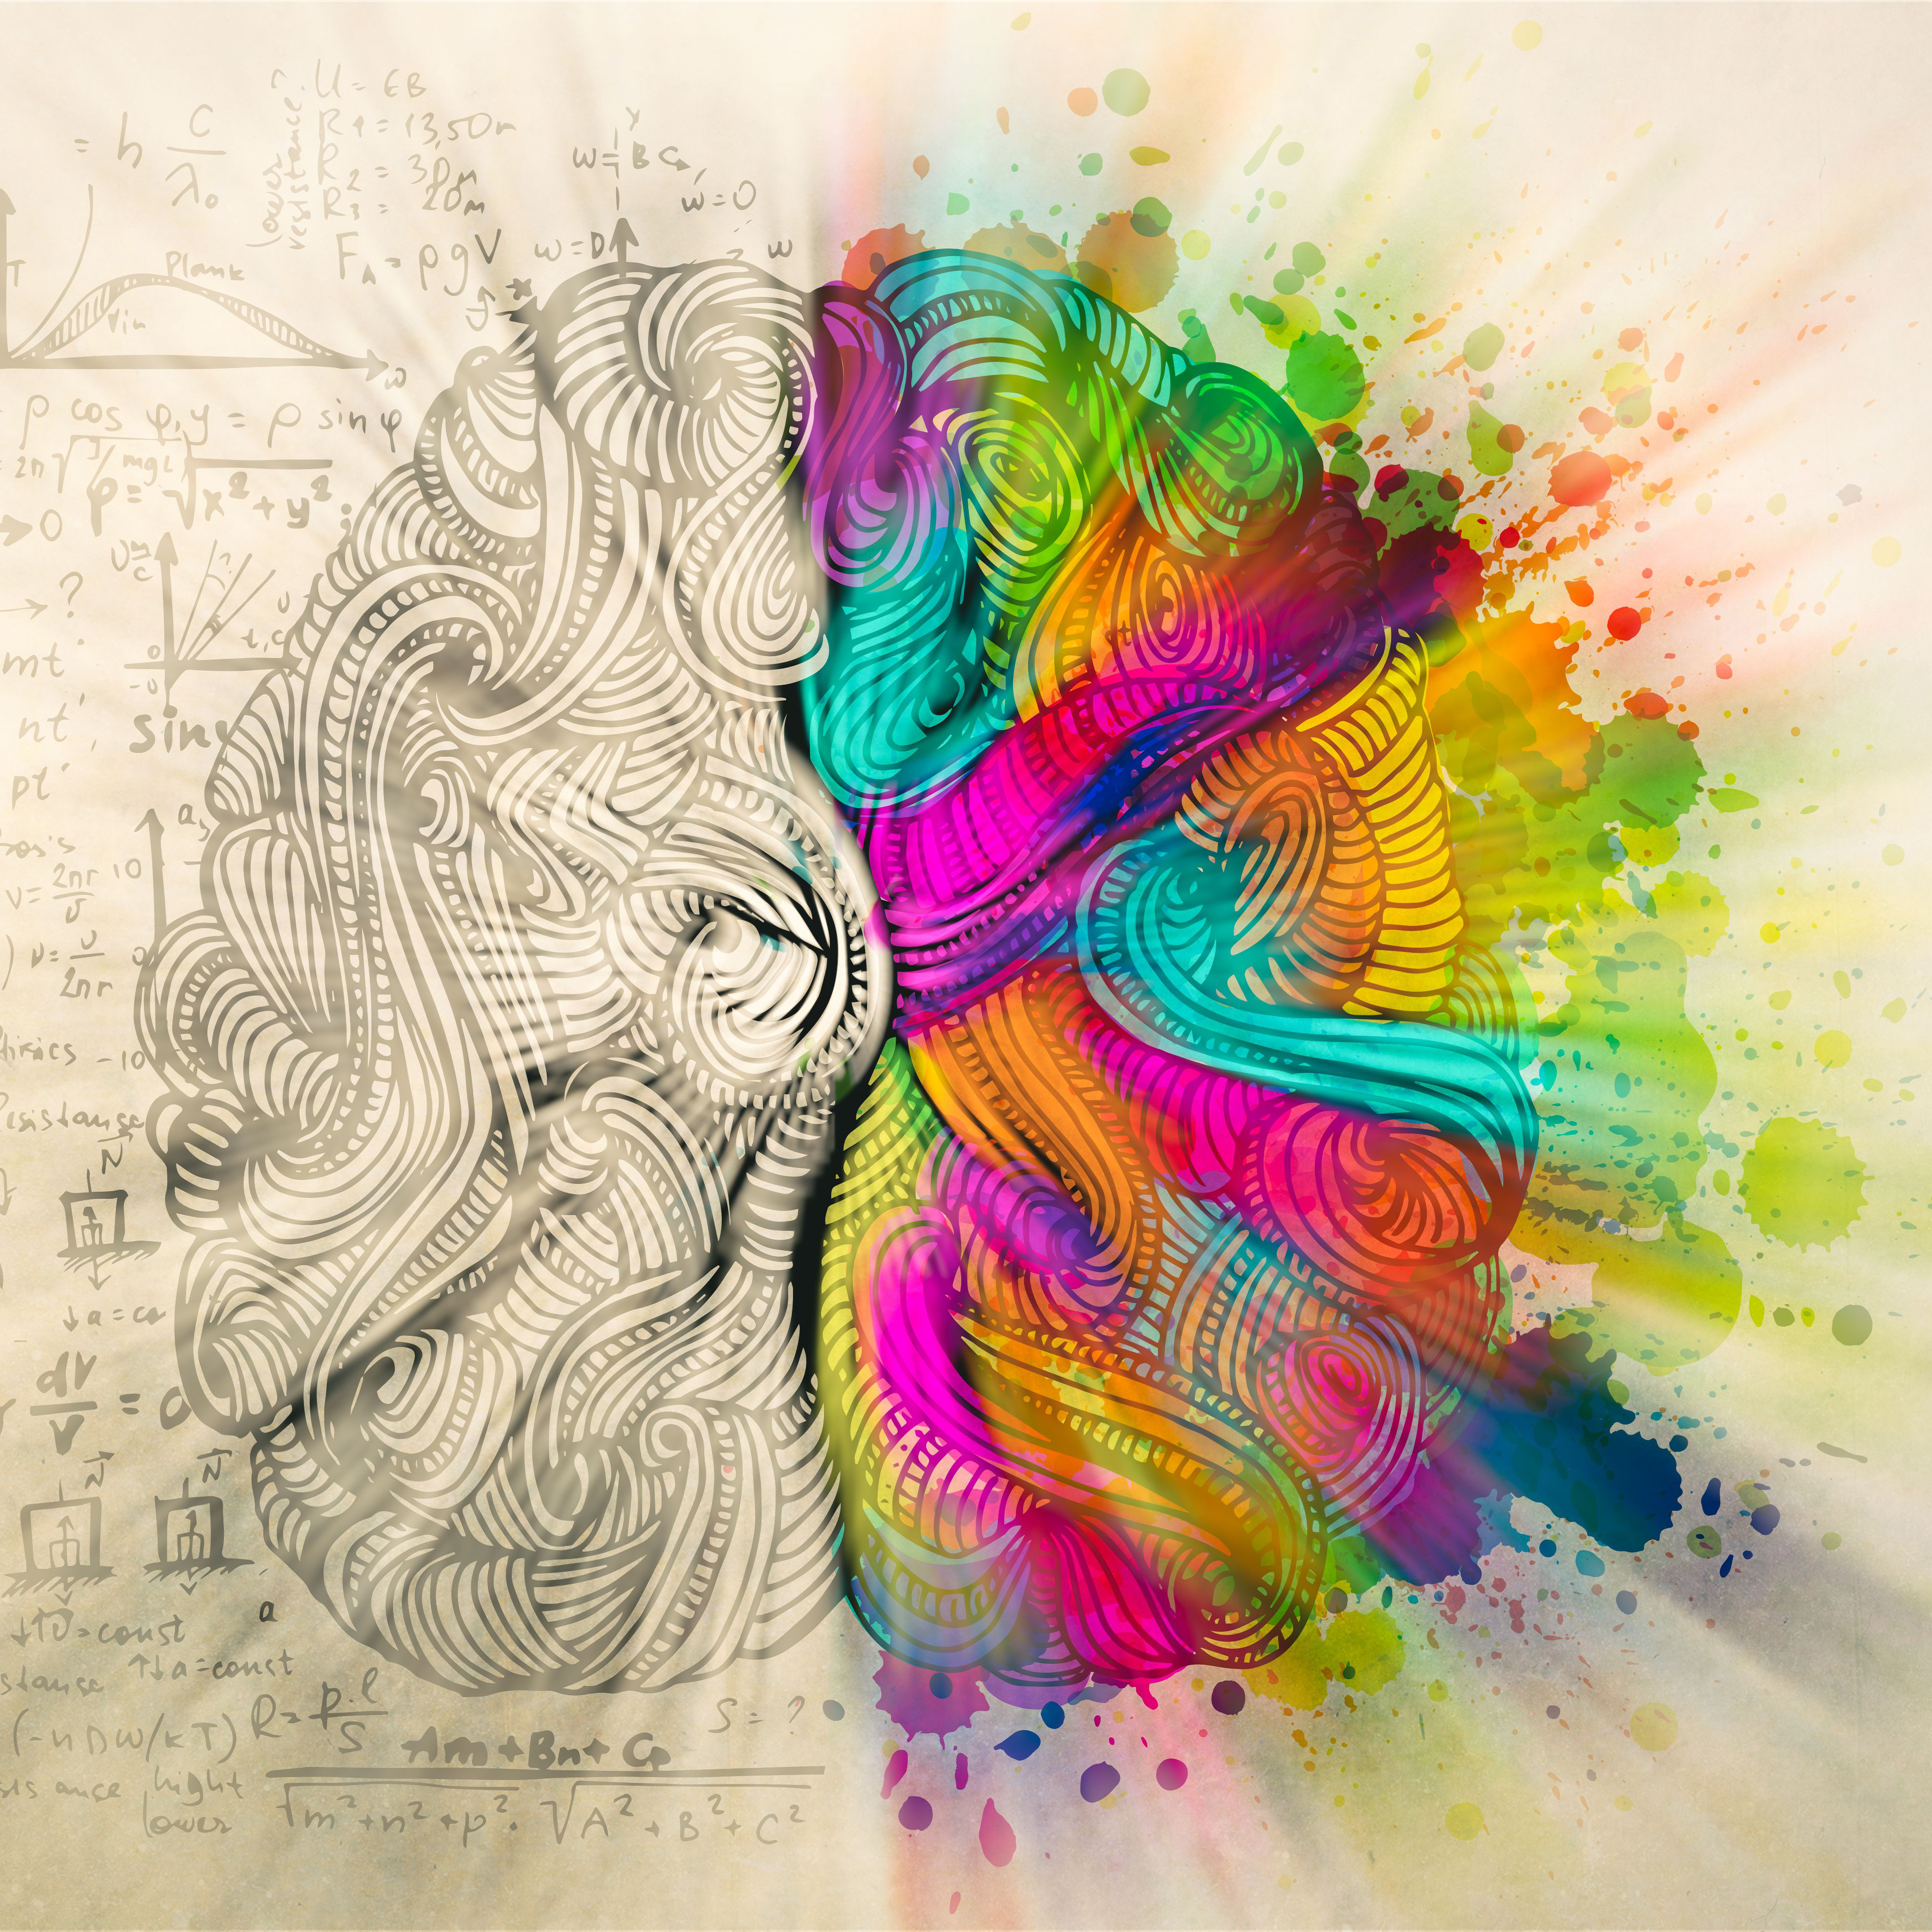 Merveilleux Science And Arts   IIASA